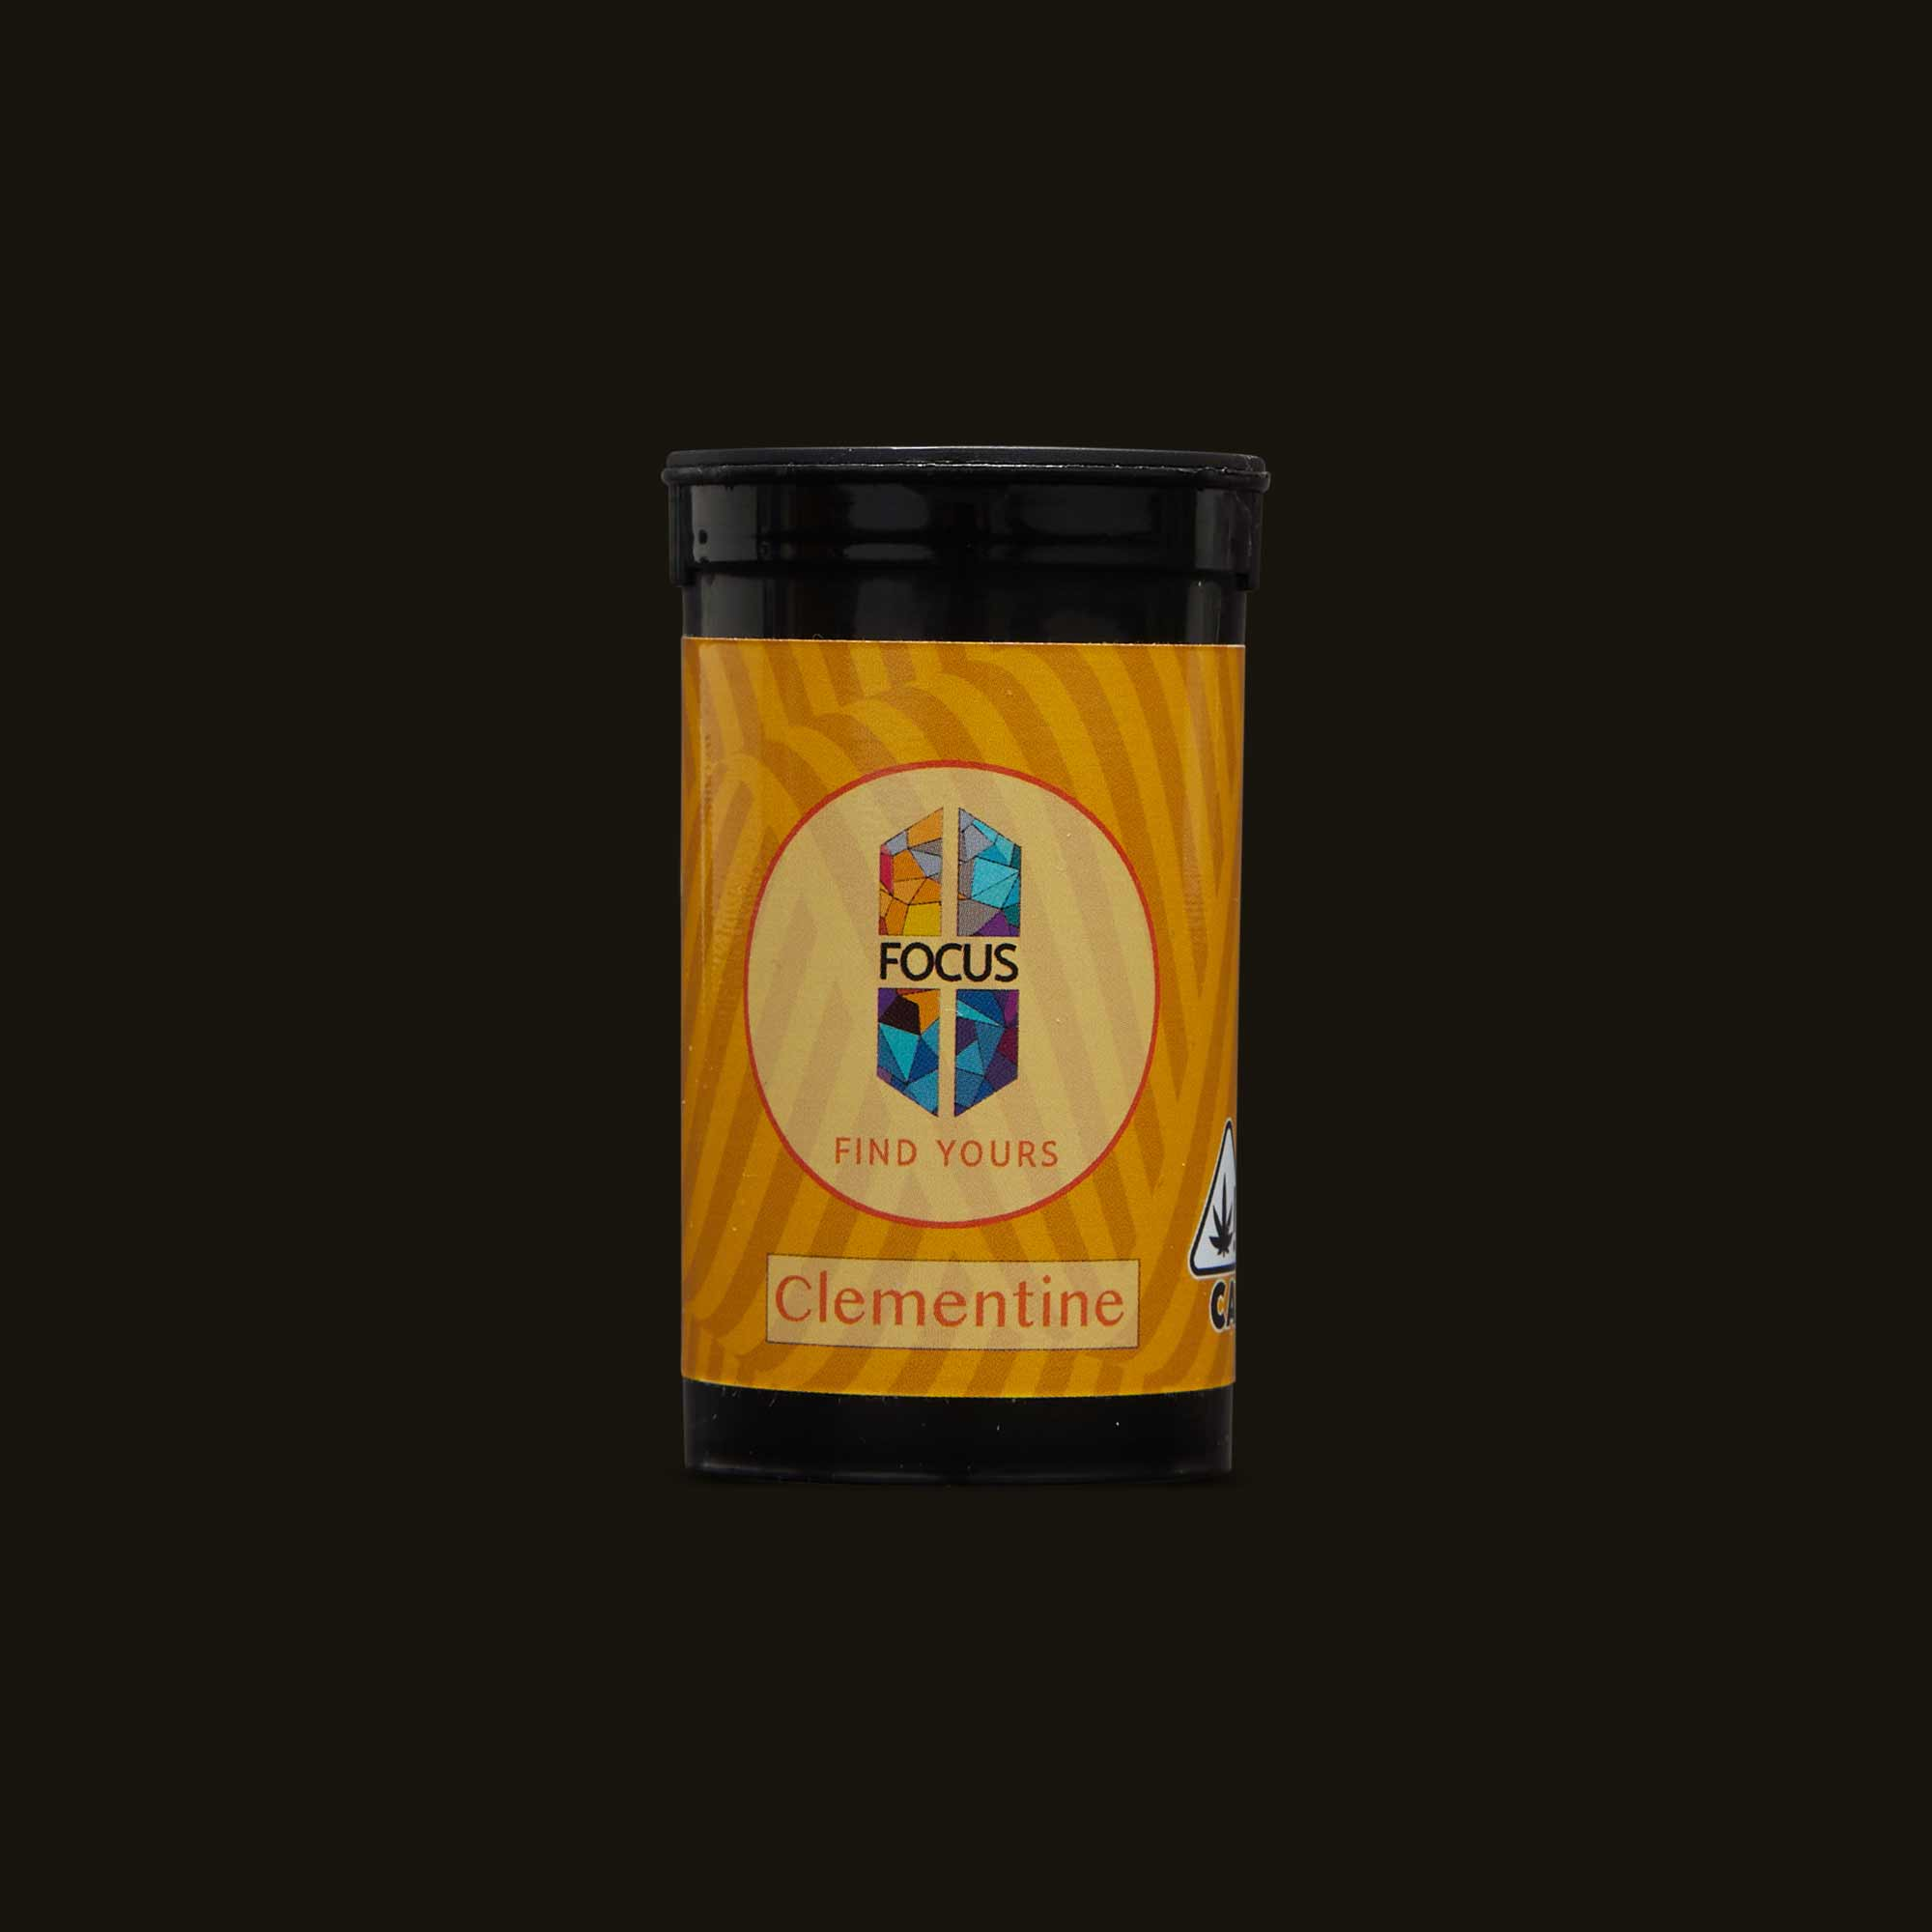 Focus Clementine Diamond Sauce